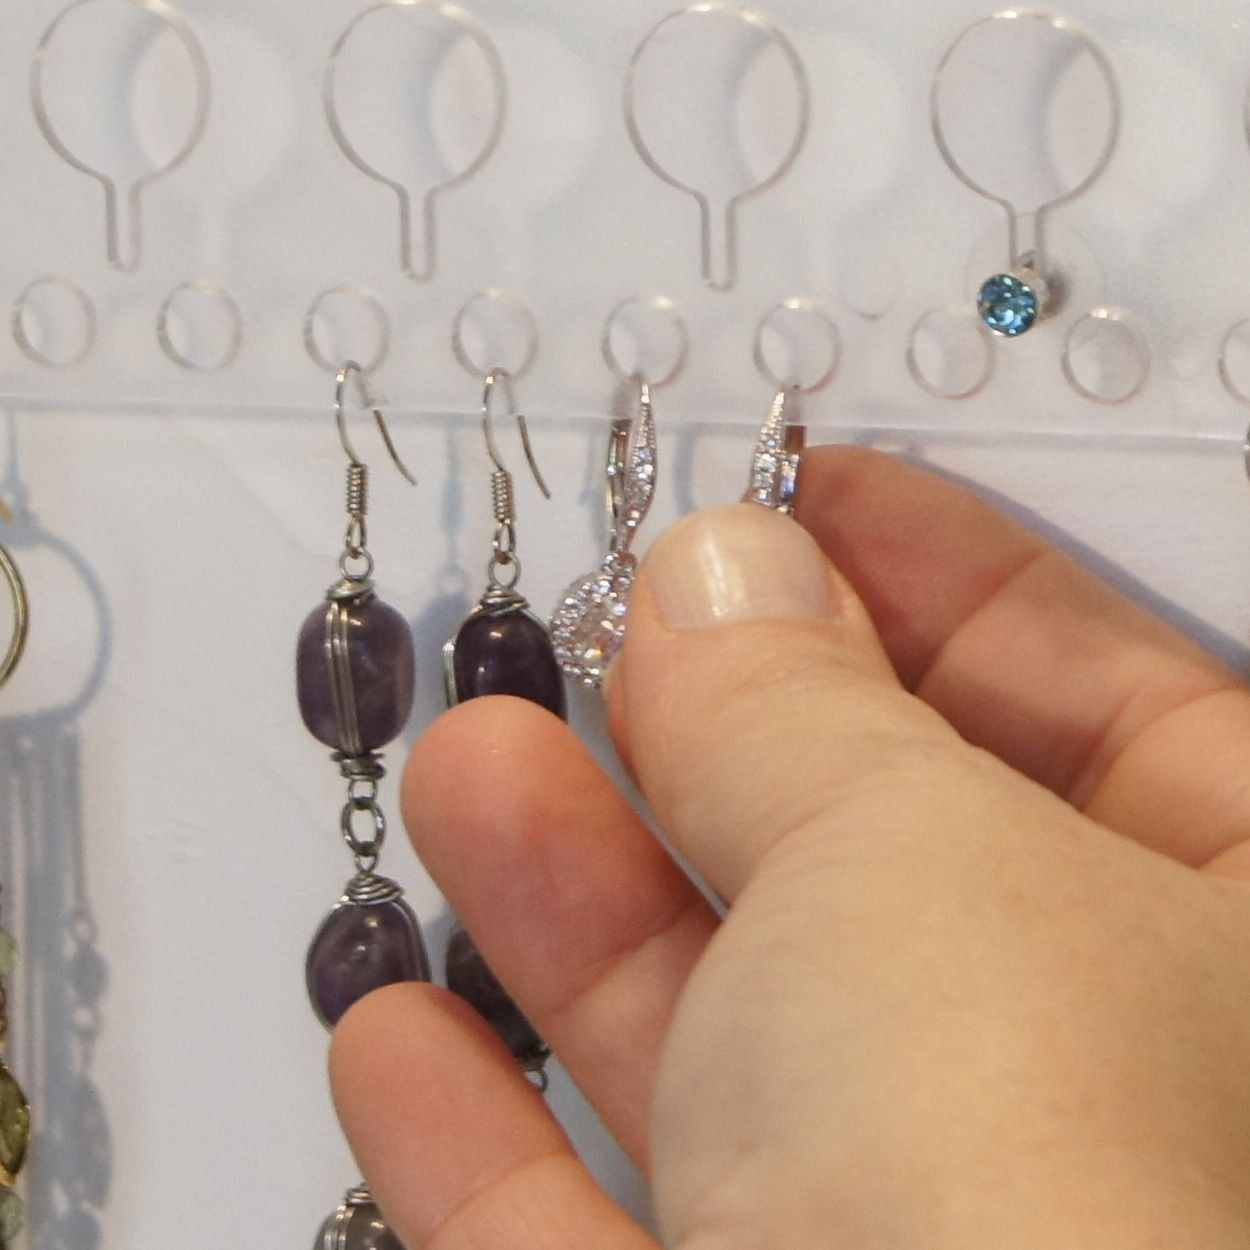 Earring Holder Organizer Wall Mount Closet Jewelry Storage Rack